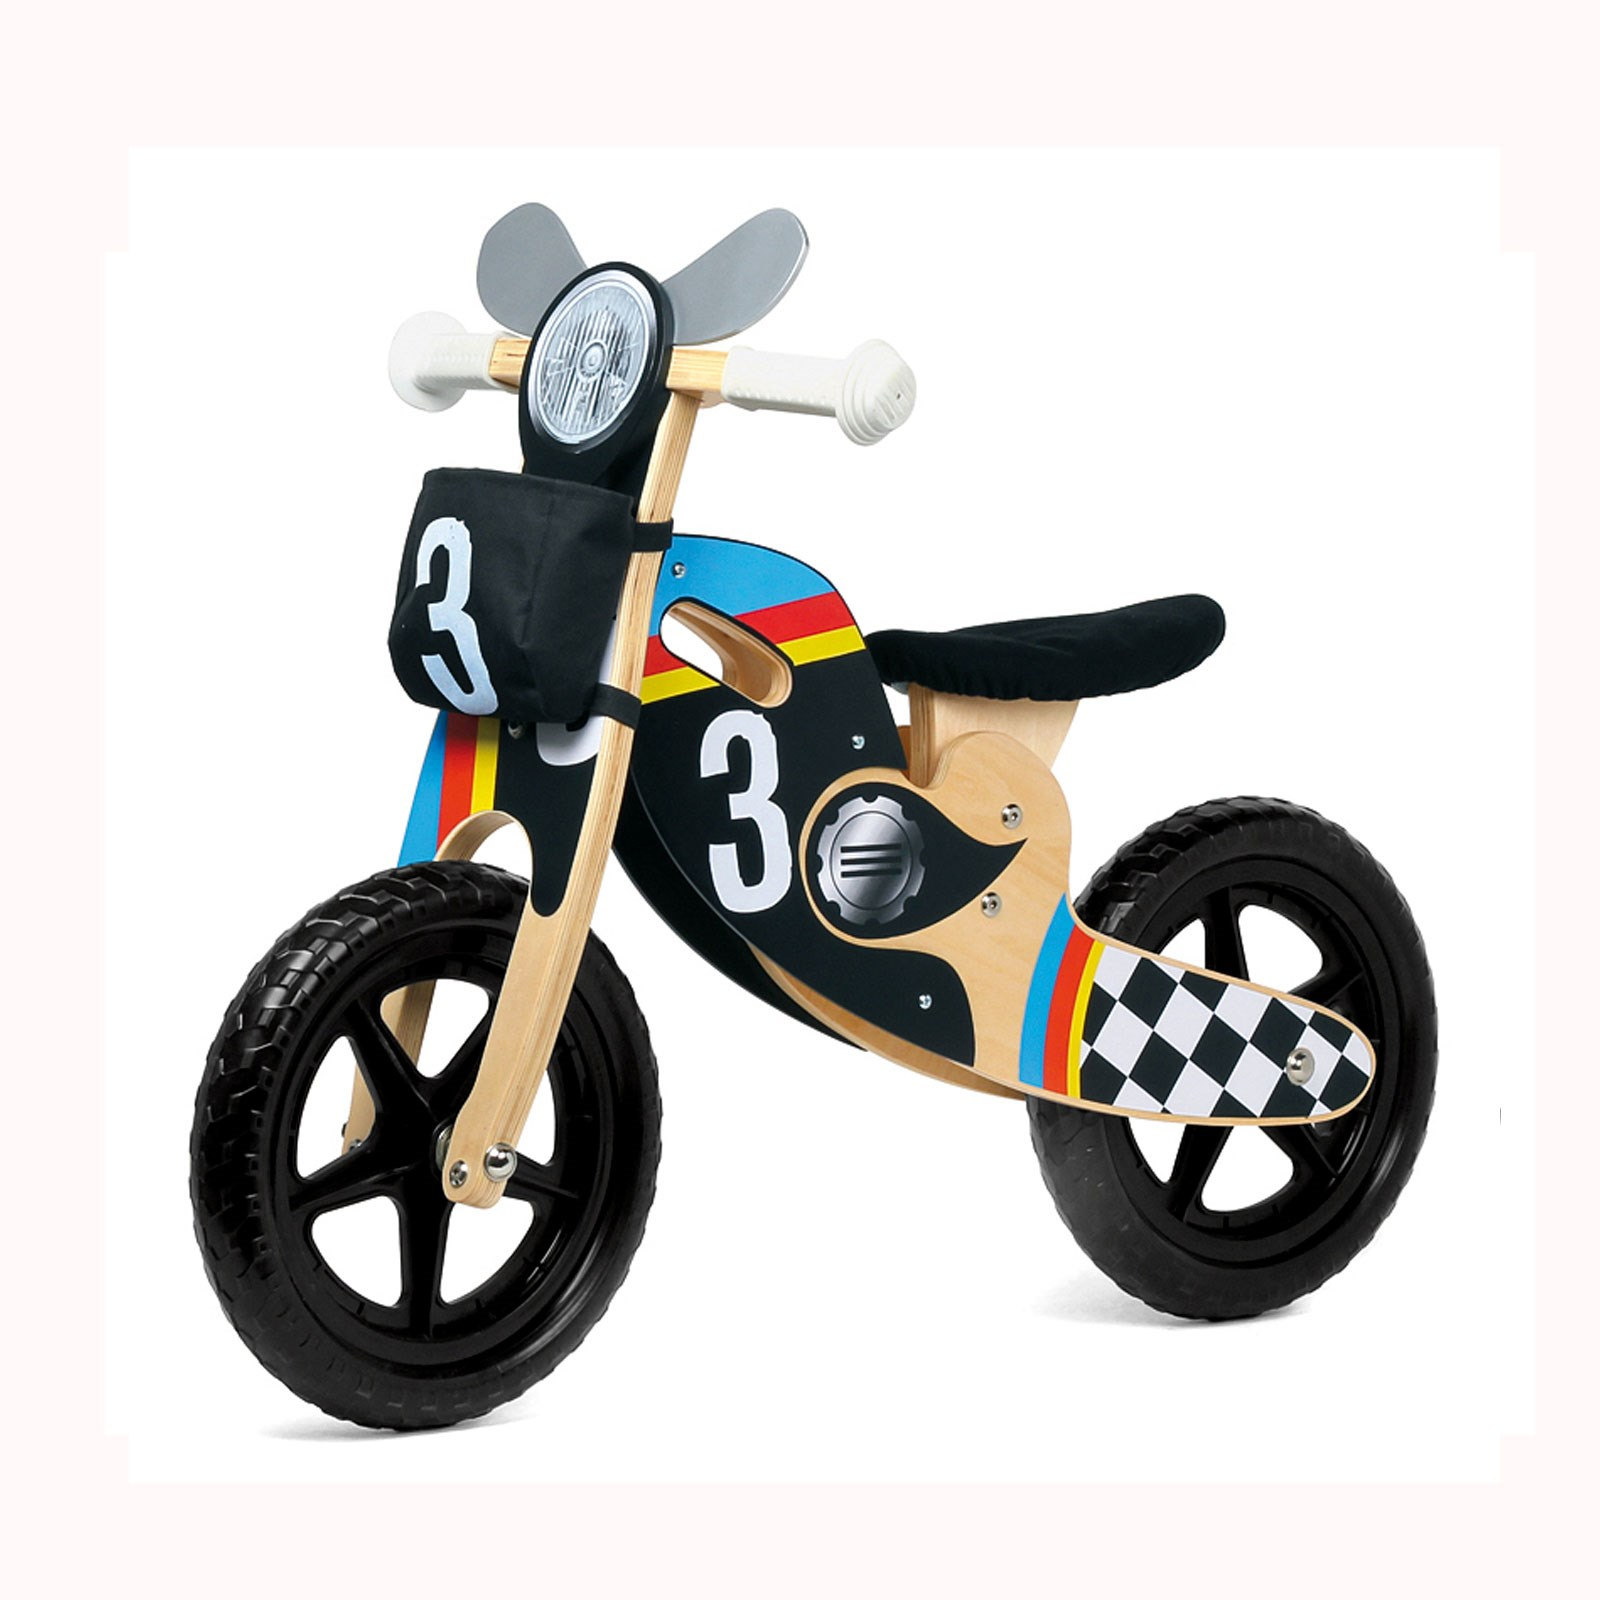 kit moto pour premier v lo id e cadeau france. Black Bedroom Furniture Sets. Home Design Ideas